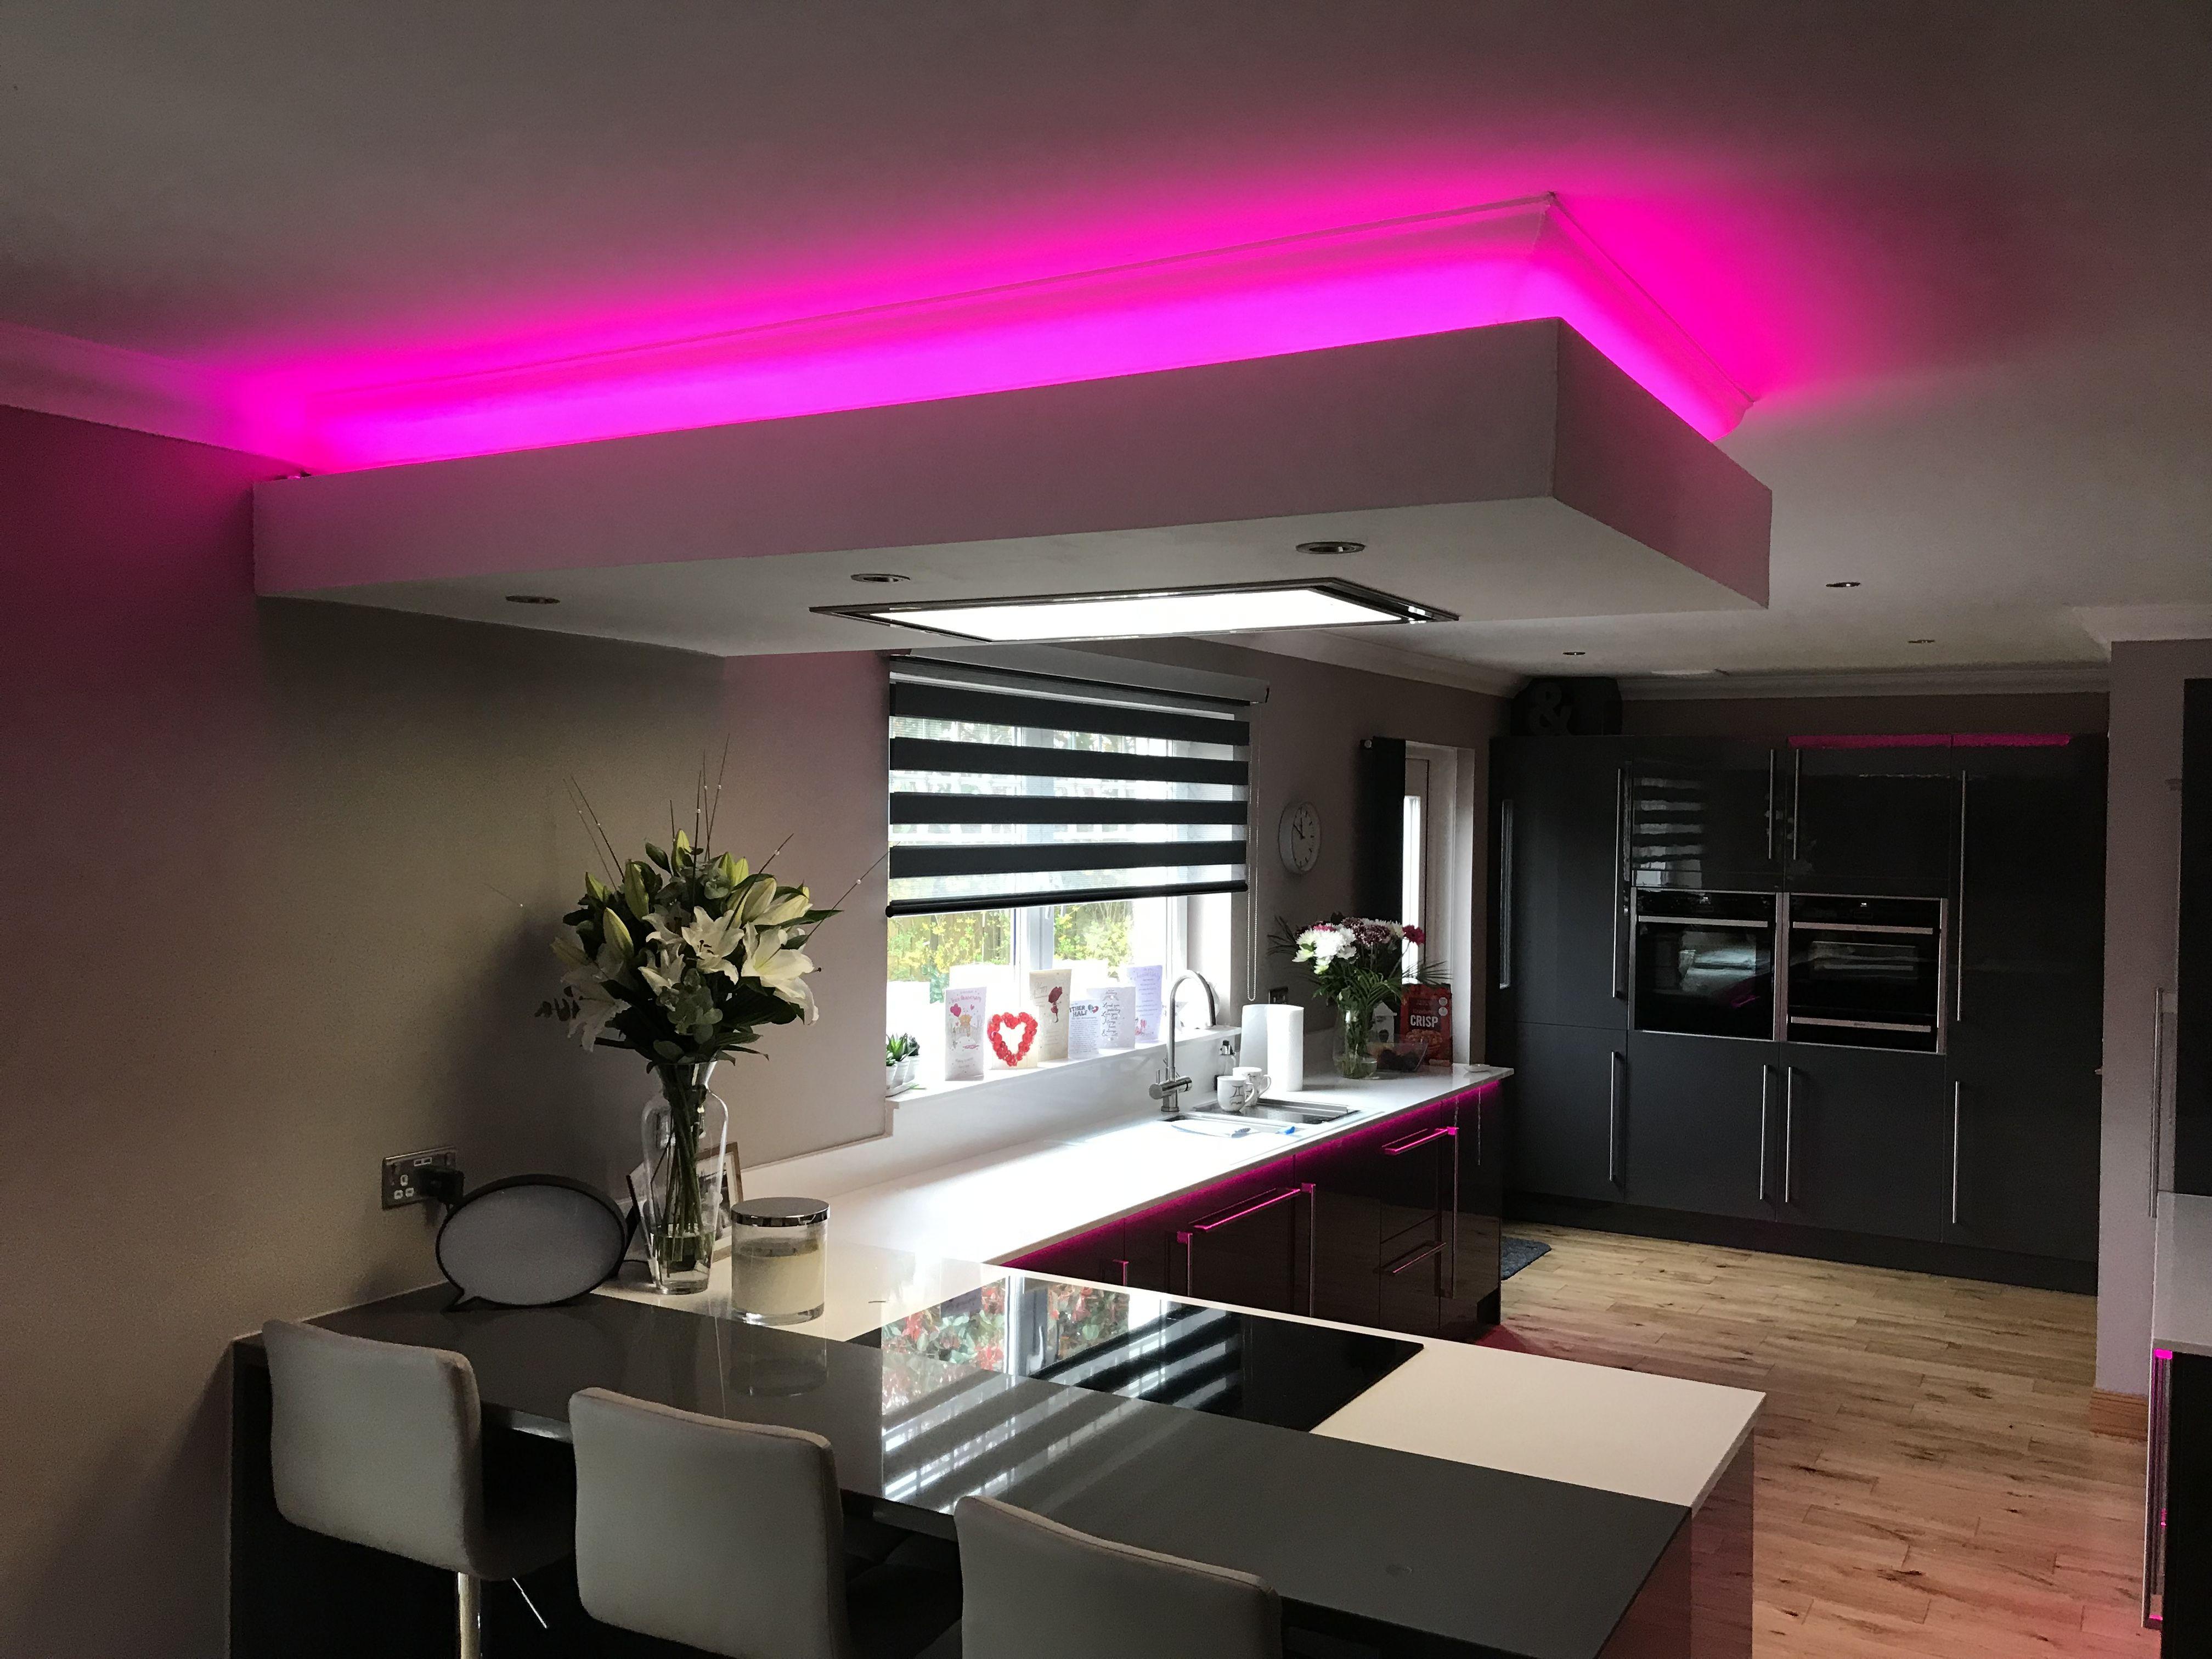 Rgb Led Strip Lighting From Eden Illumination Kitchen Led Lighting Led Kitchen Ceiling Lights Led Lights